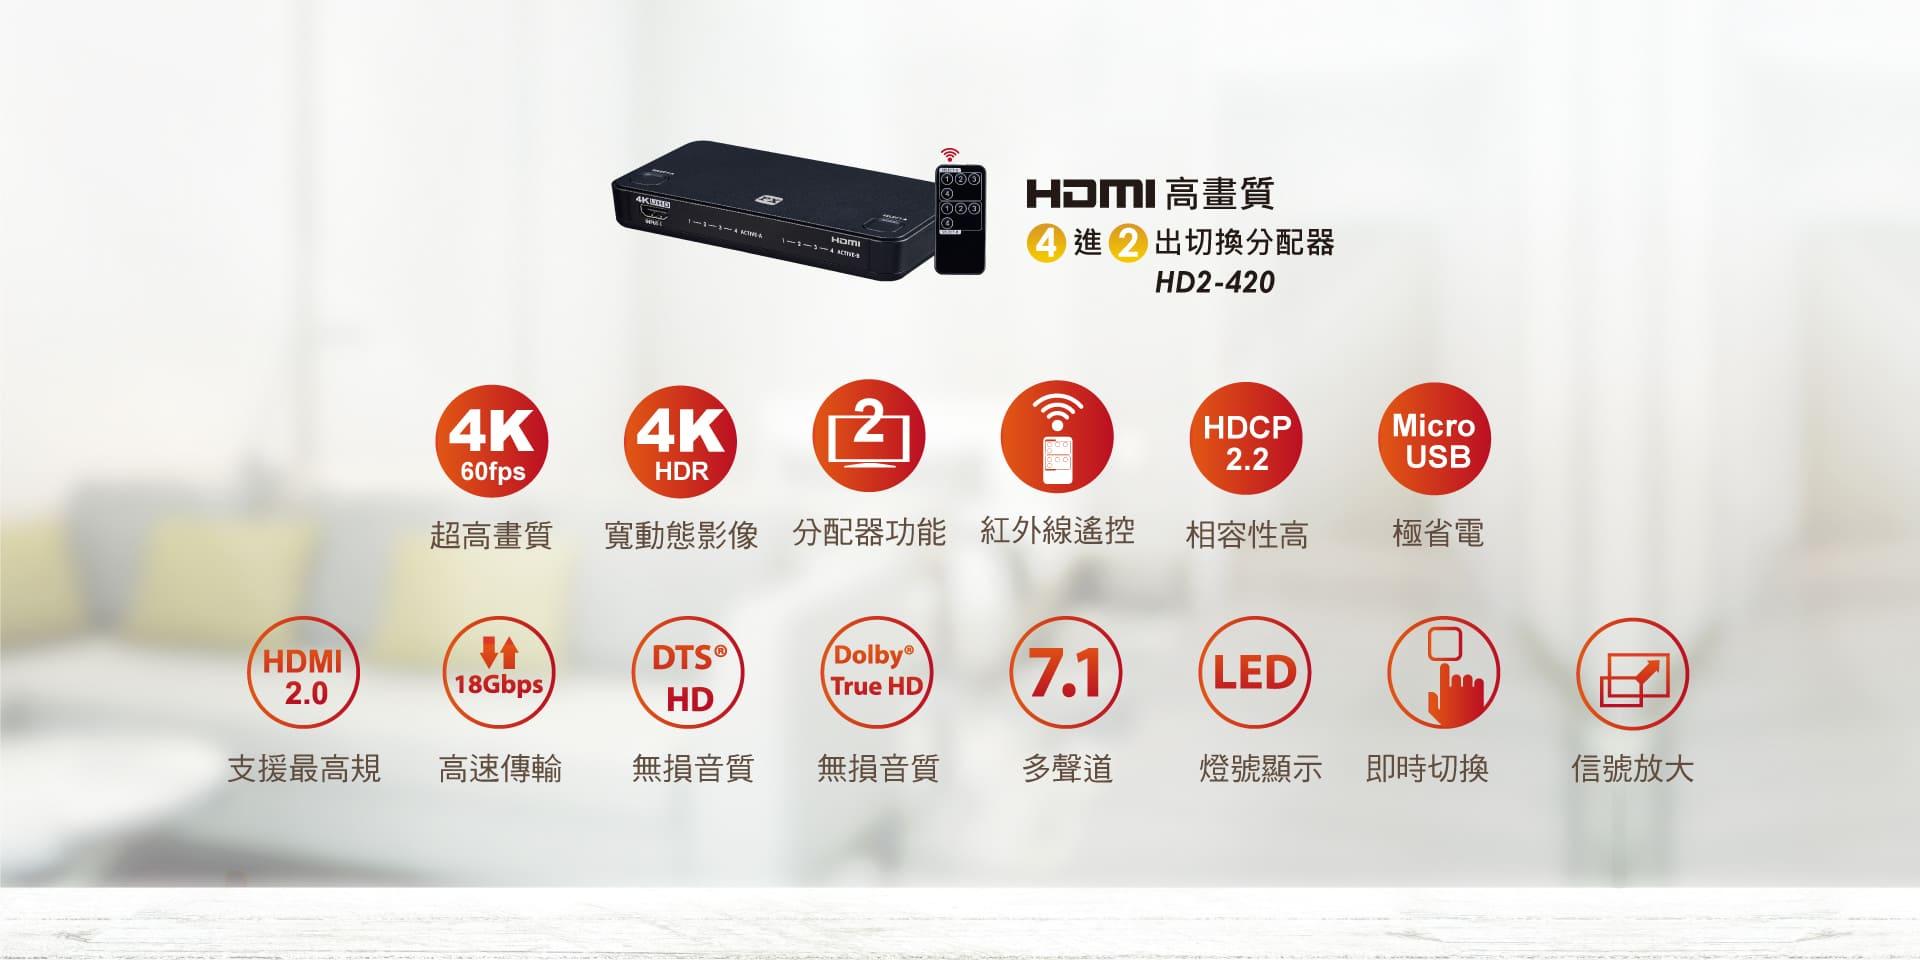 proimages/product/HDMI/HD2-420/HD2-420_02.jpg